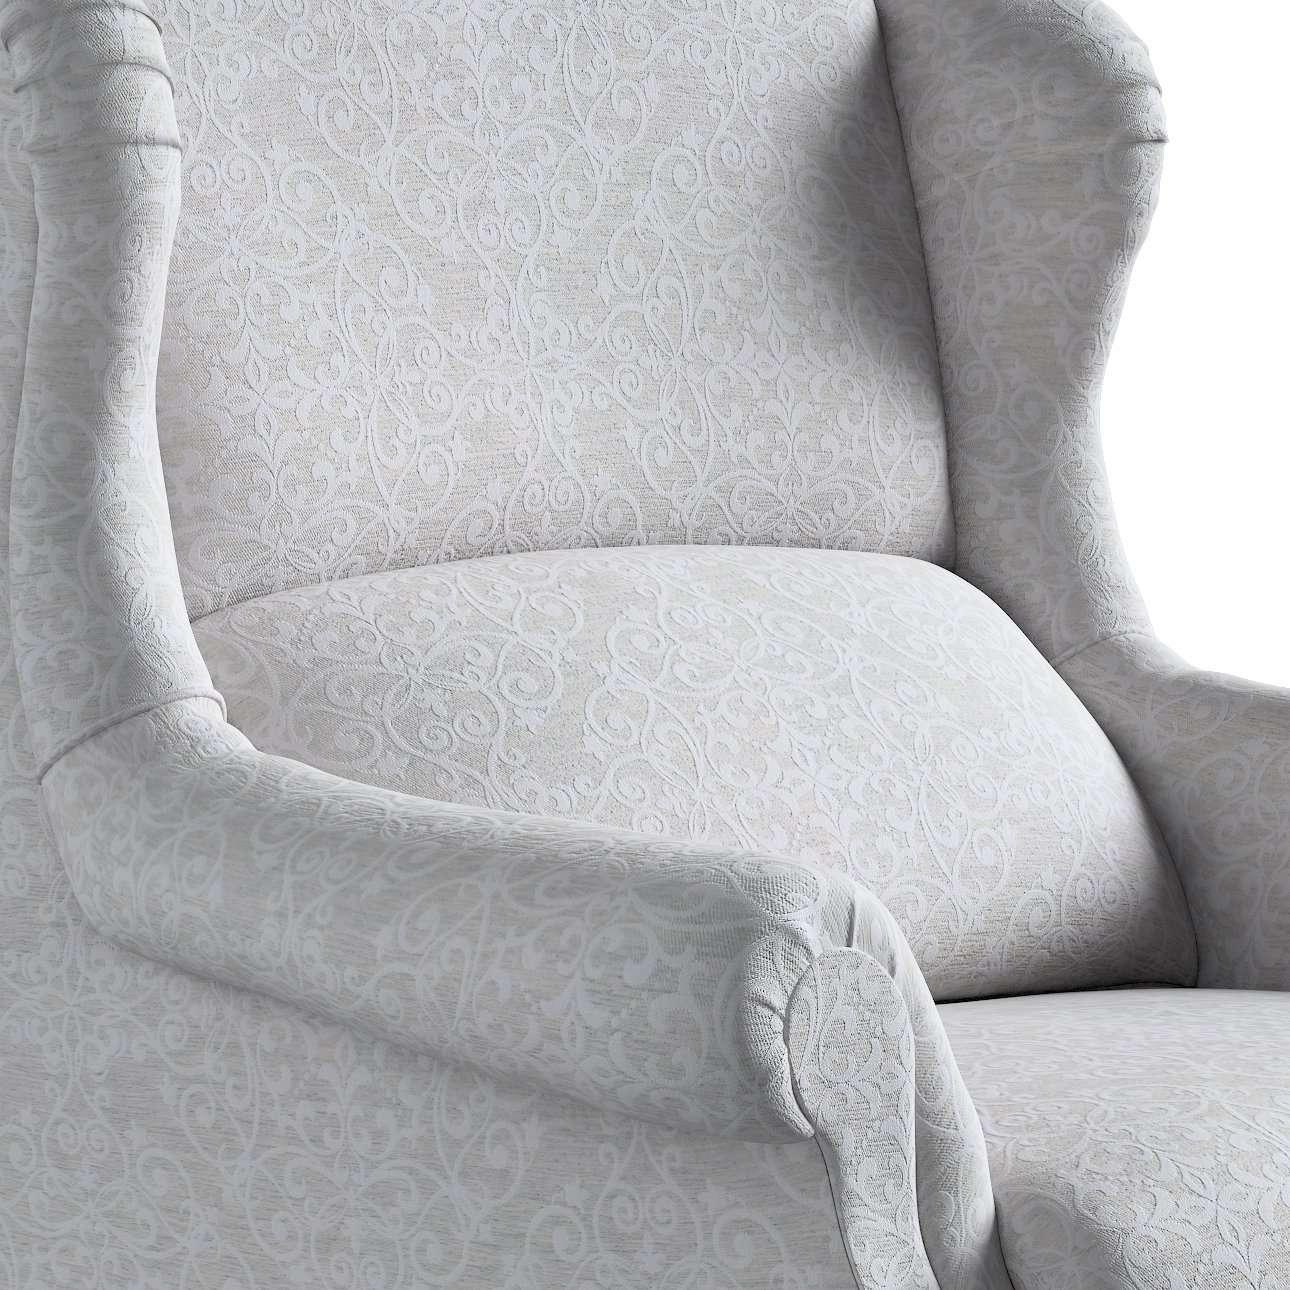 Stilingas Dekoria fotelis 63 x 115 cm kolekcijoje Venice, audinys: 140-49